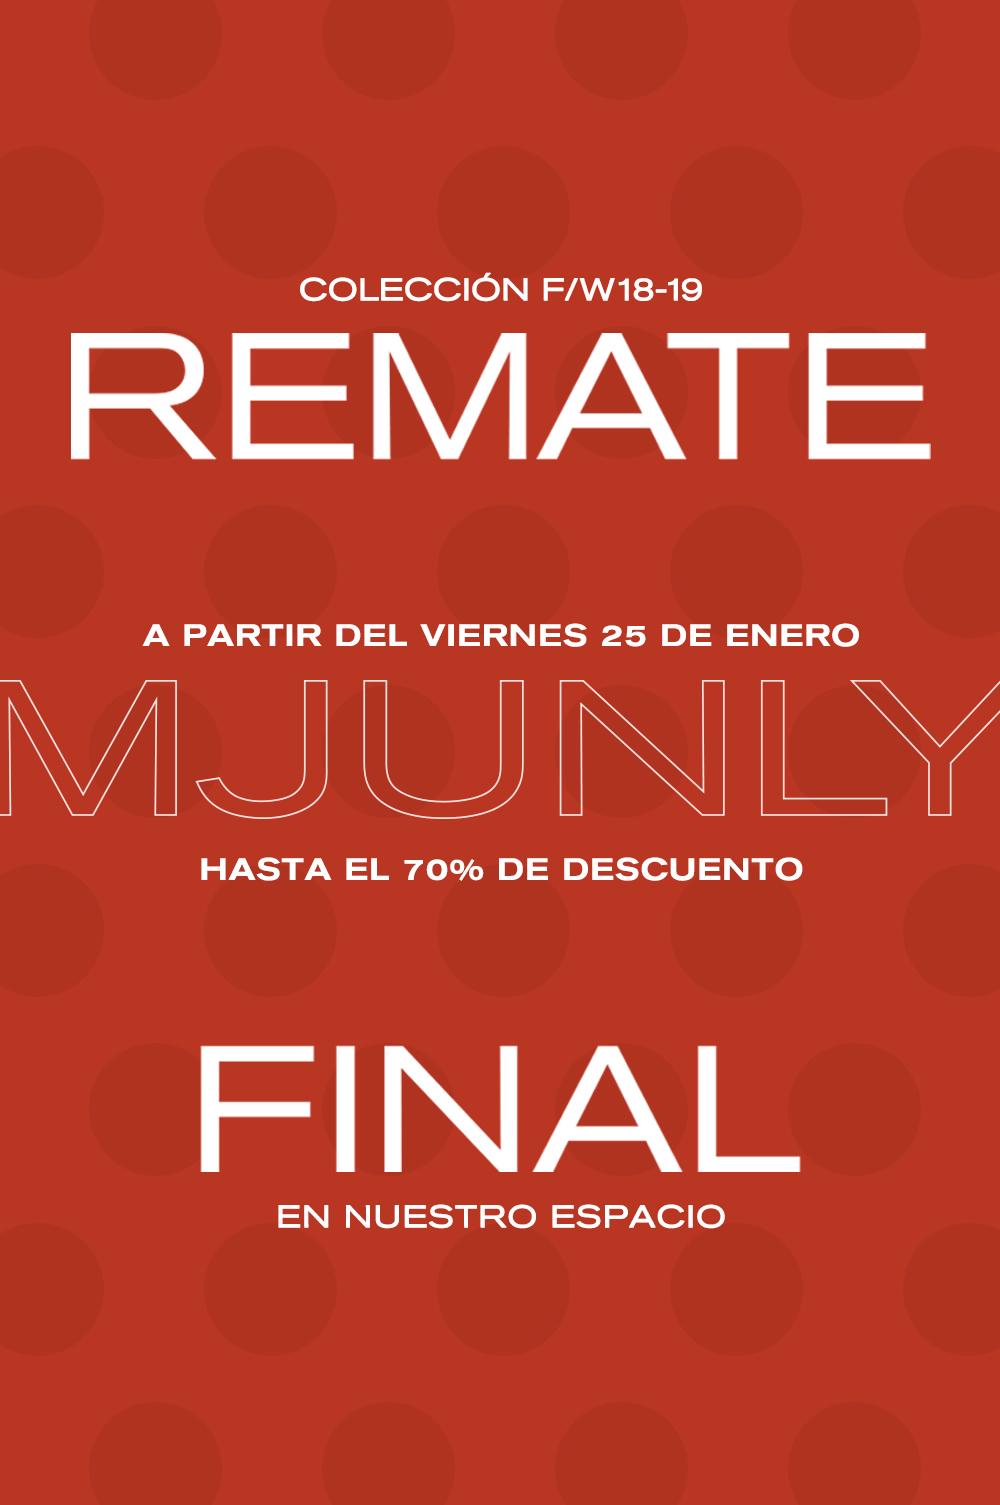 MJUNLY-REMATE-FW1819-OK.jpg